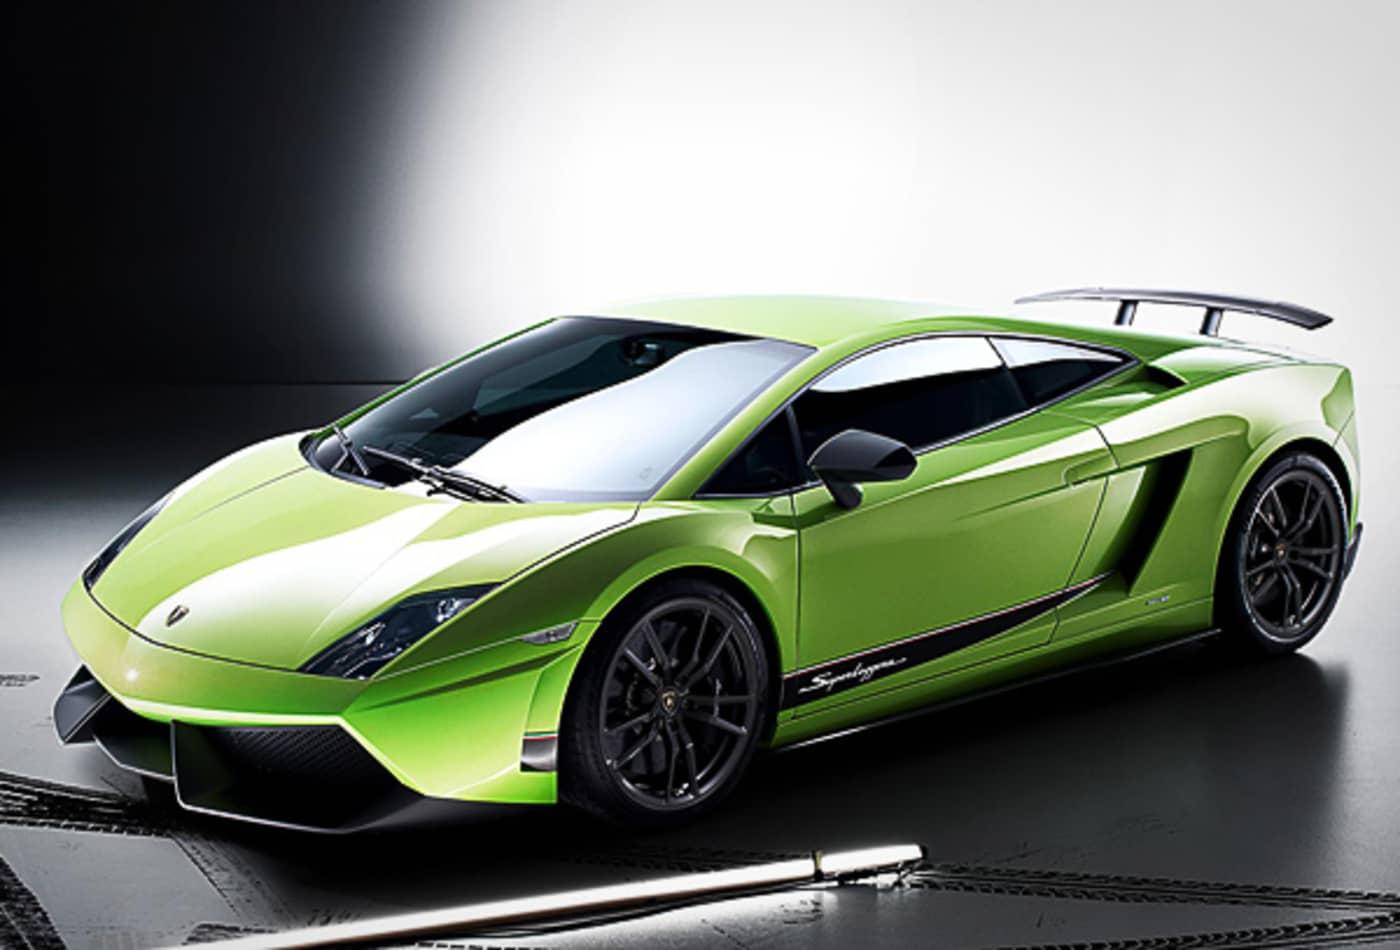 Lamborghini-Gallardo-10-Fastest-Cars-2013-CNBC.jpg